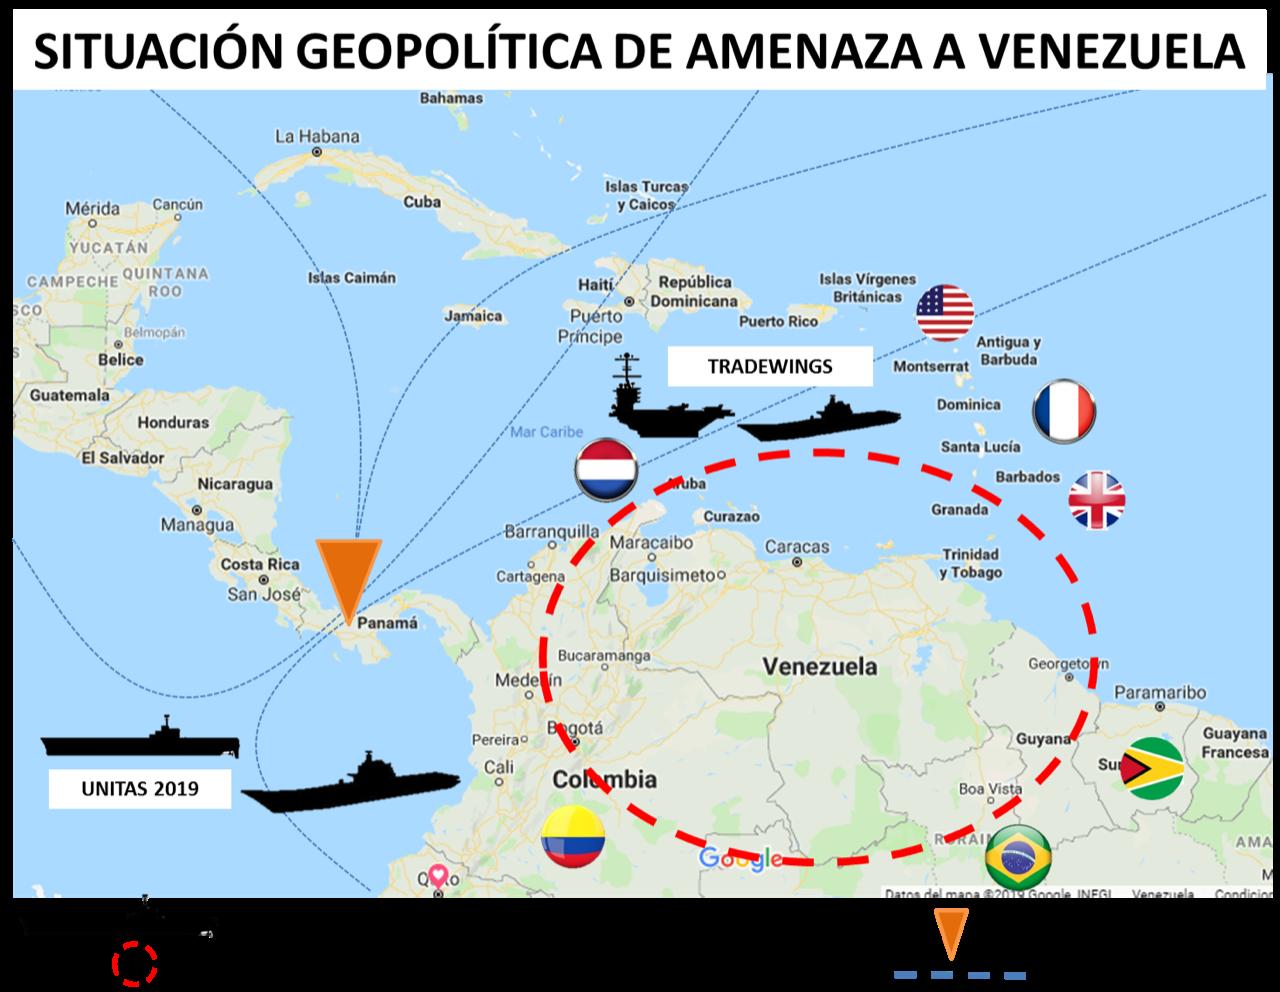 Mapa de amenaza geopolitica a Venezuela